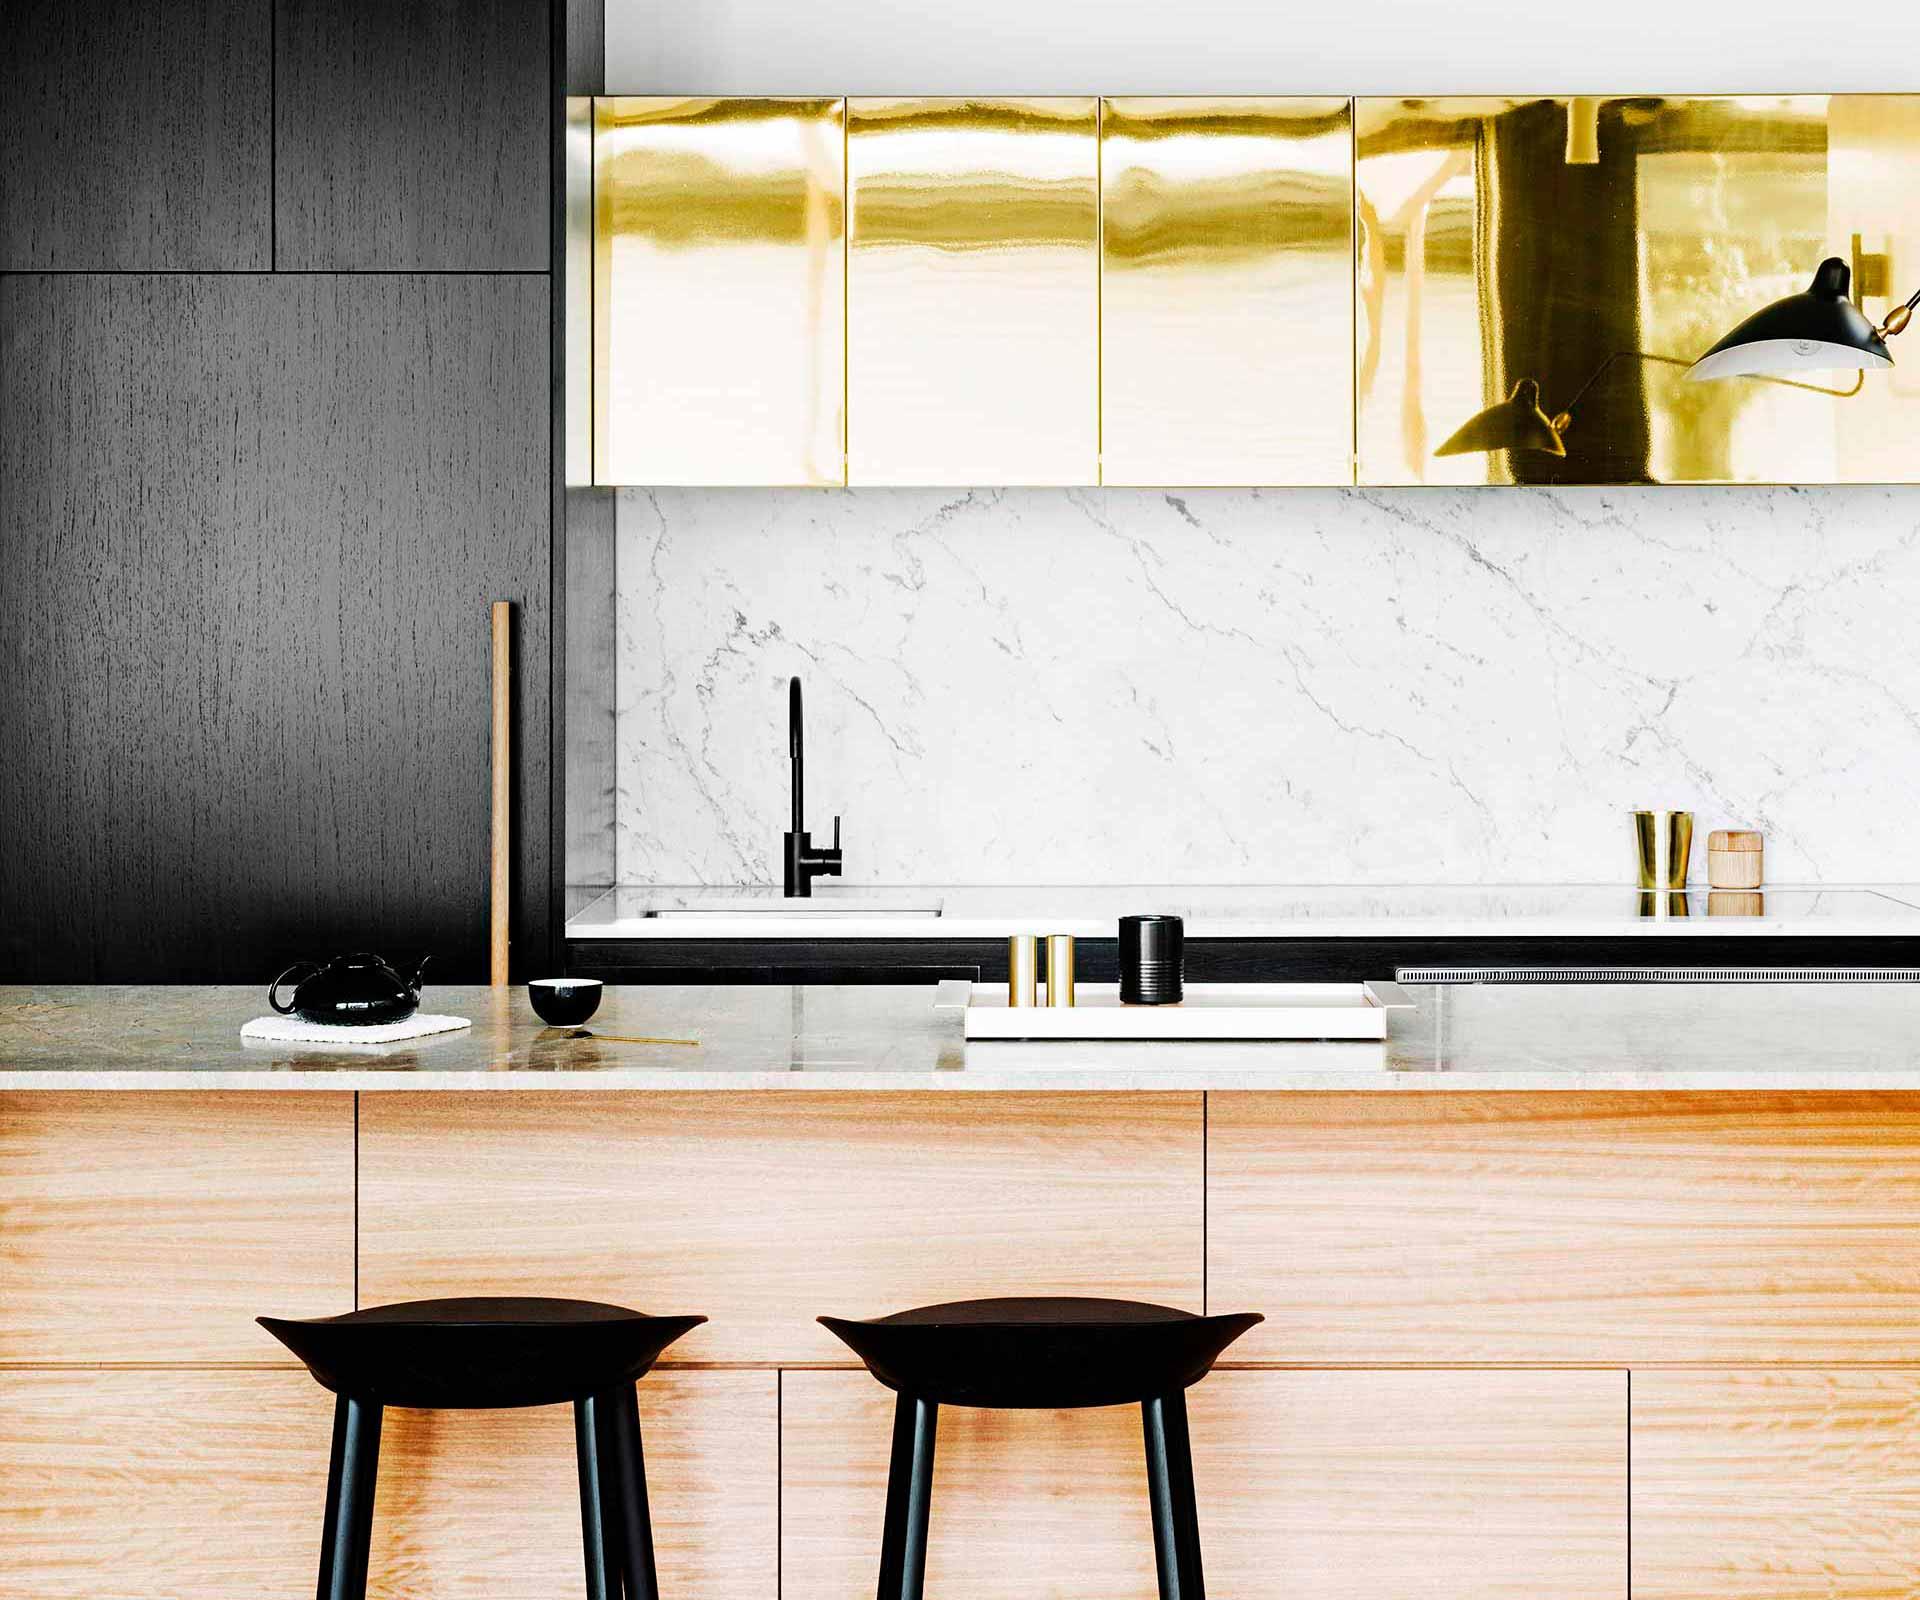 8 kitchen renovation steps from start to finish